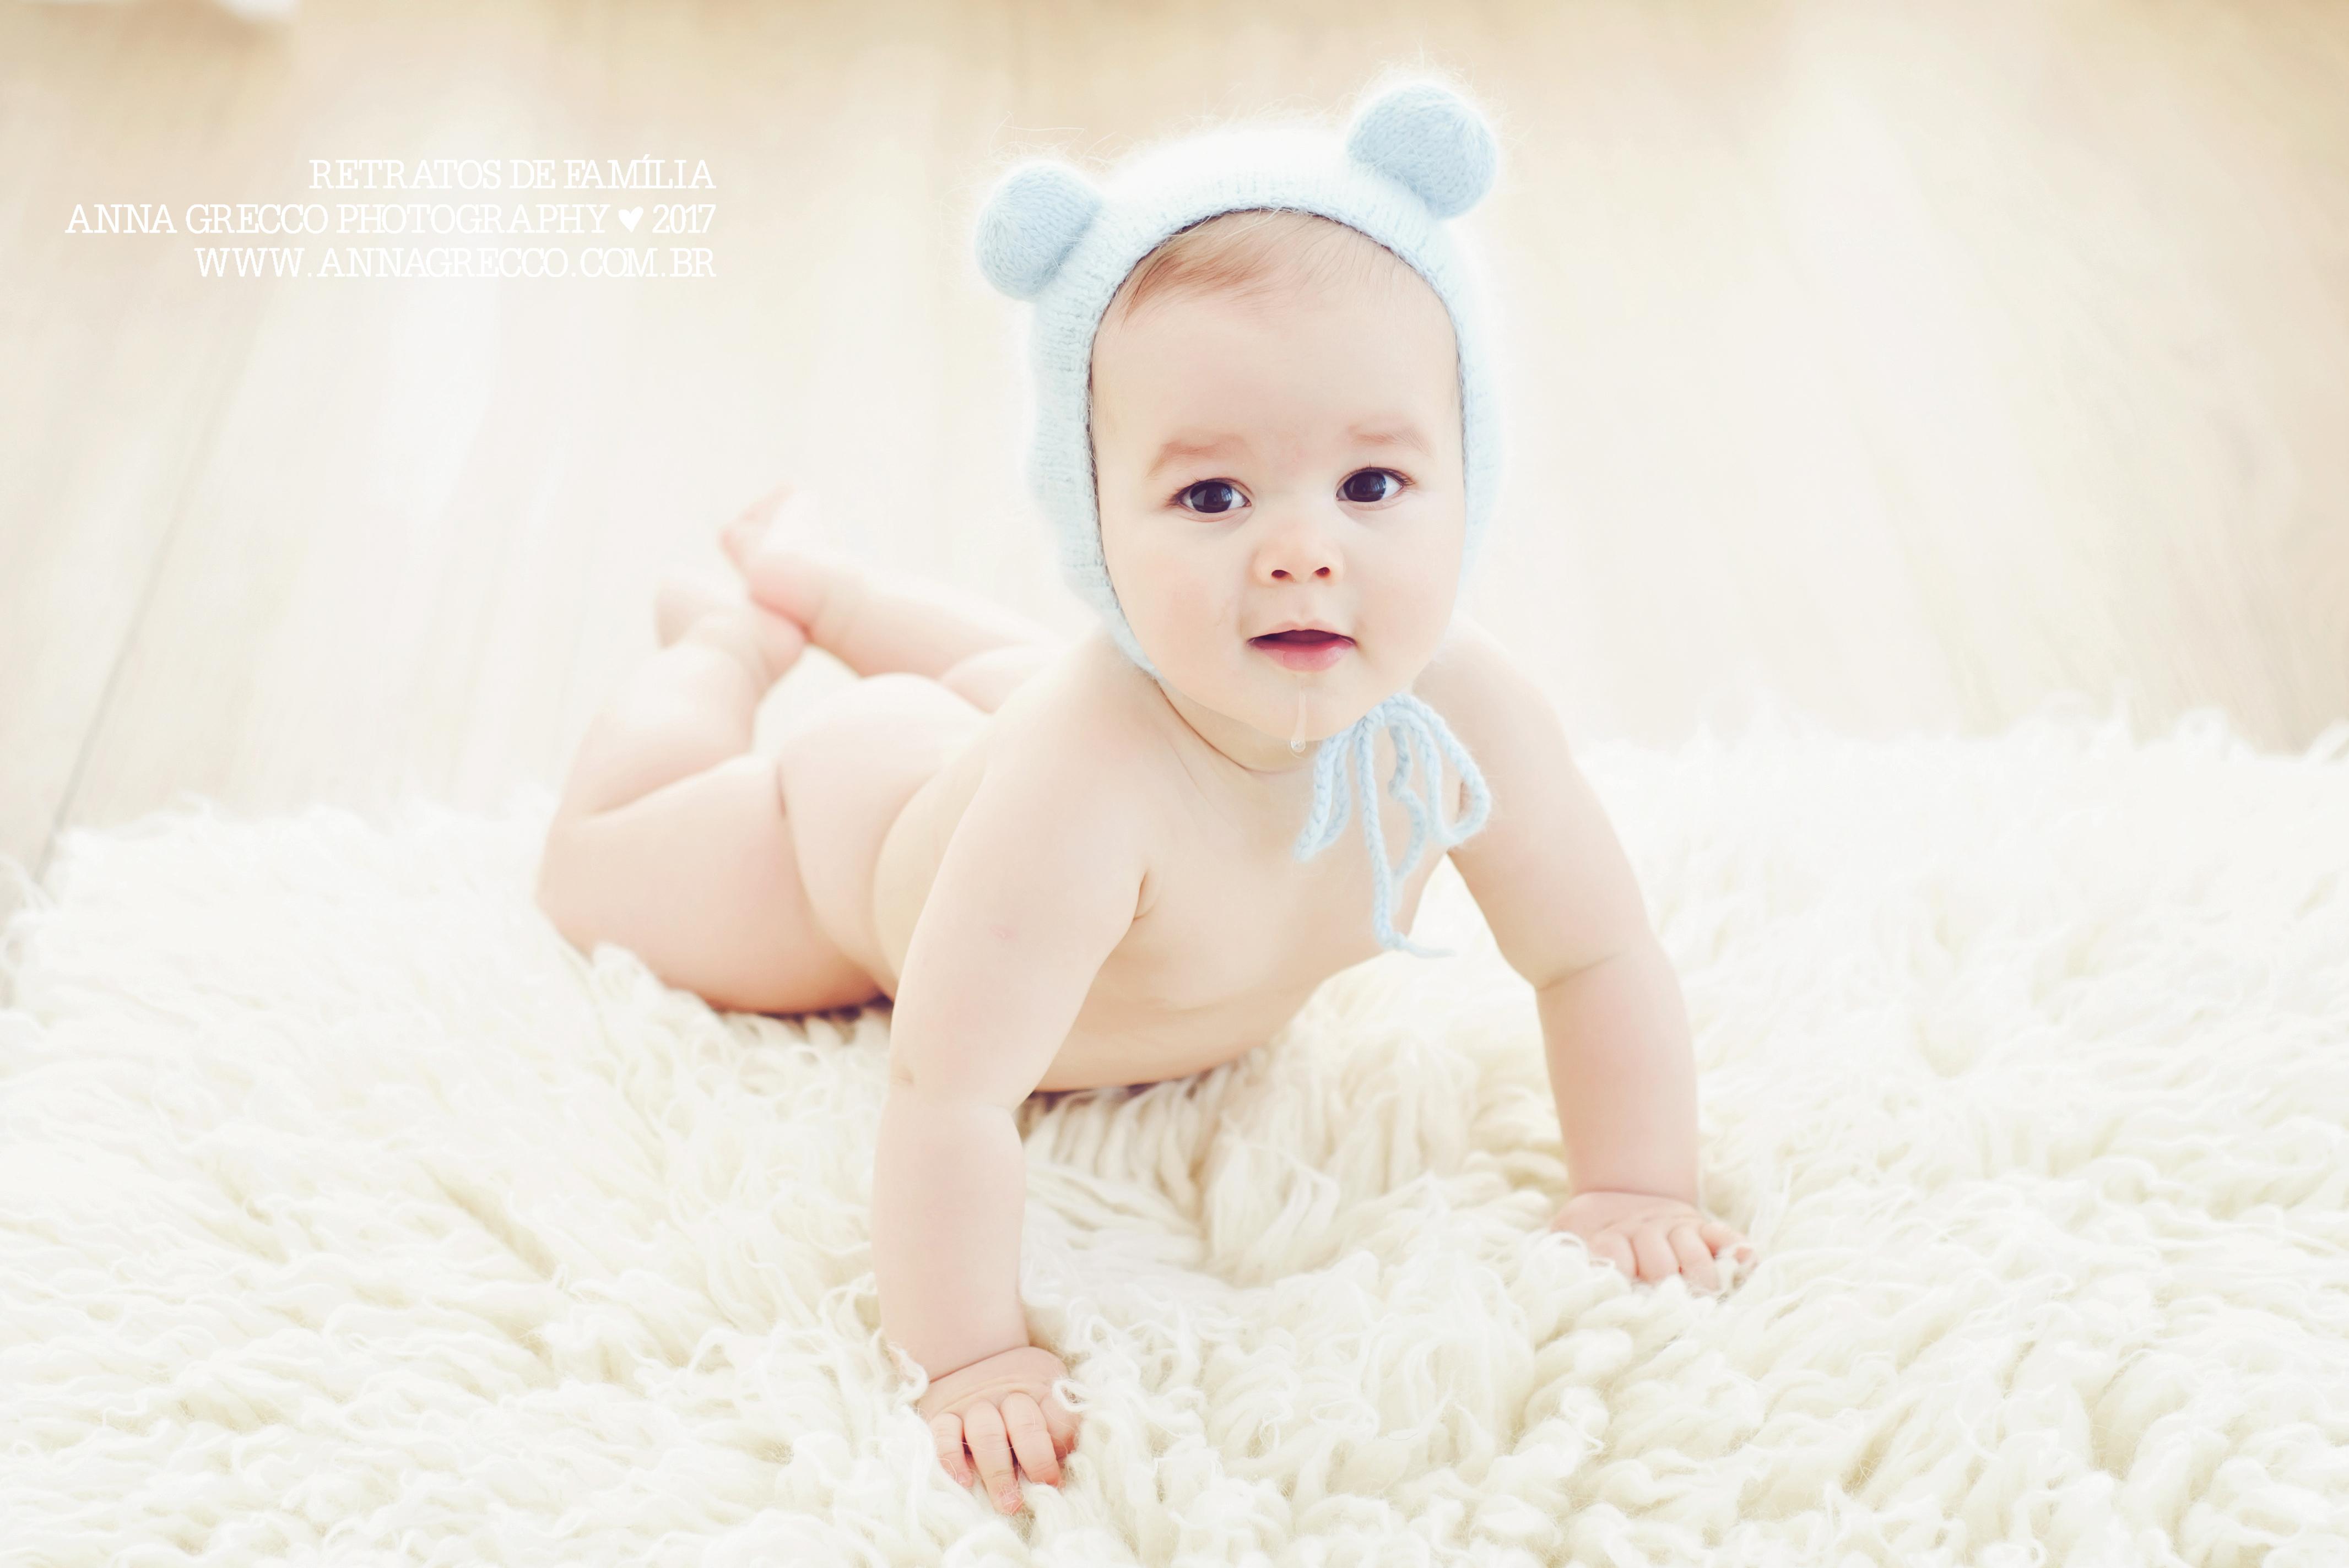 www.annagrecco.com.br Fotos de bebês - 6 meses